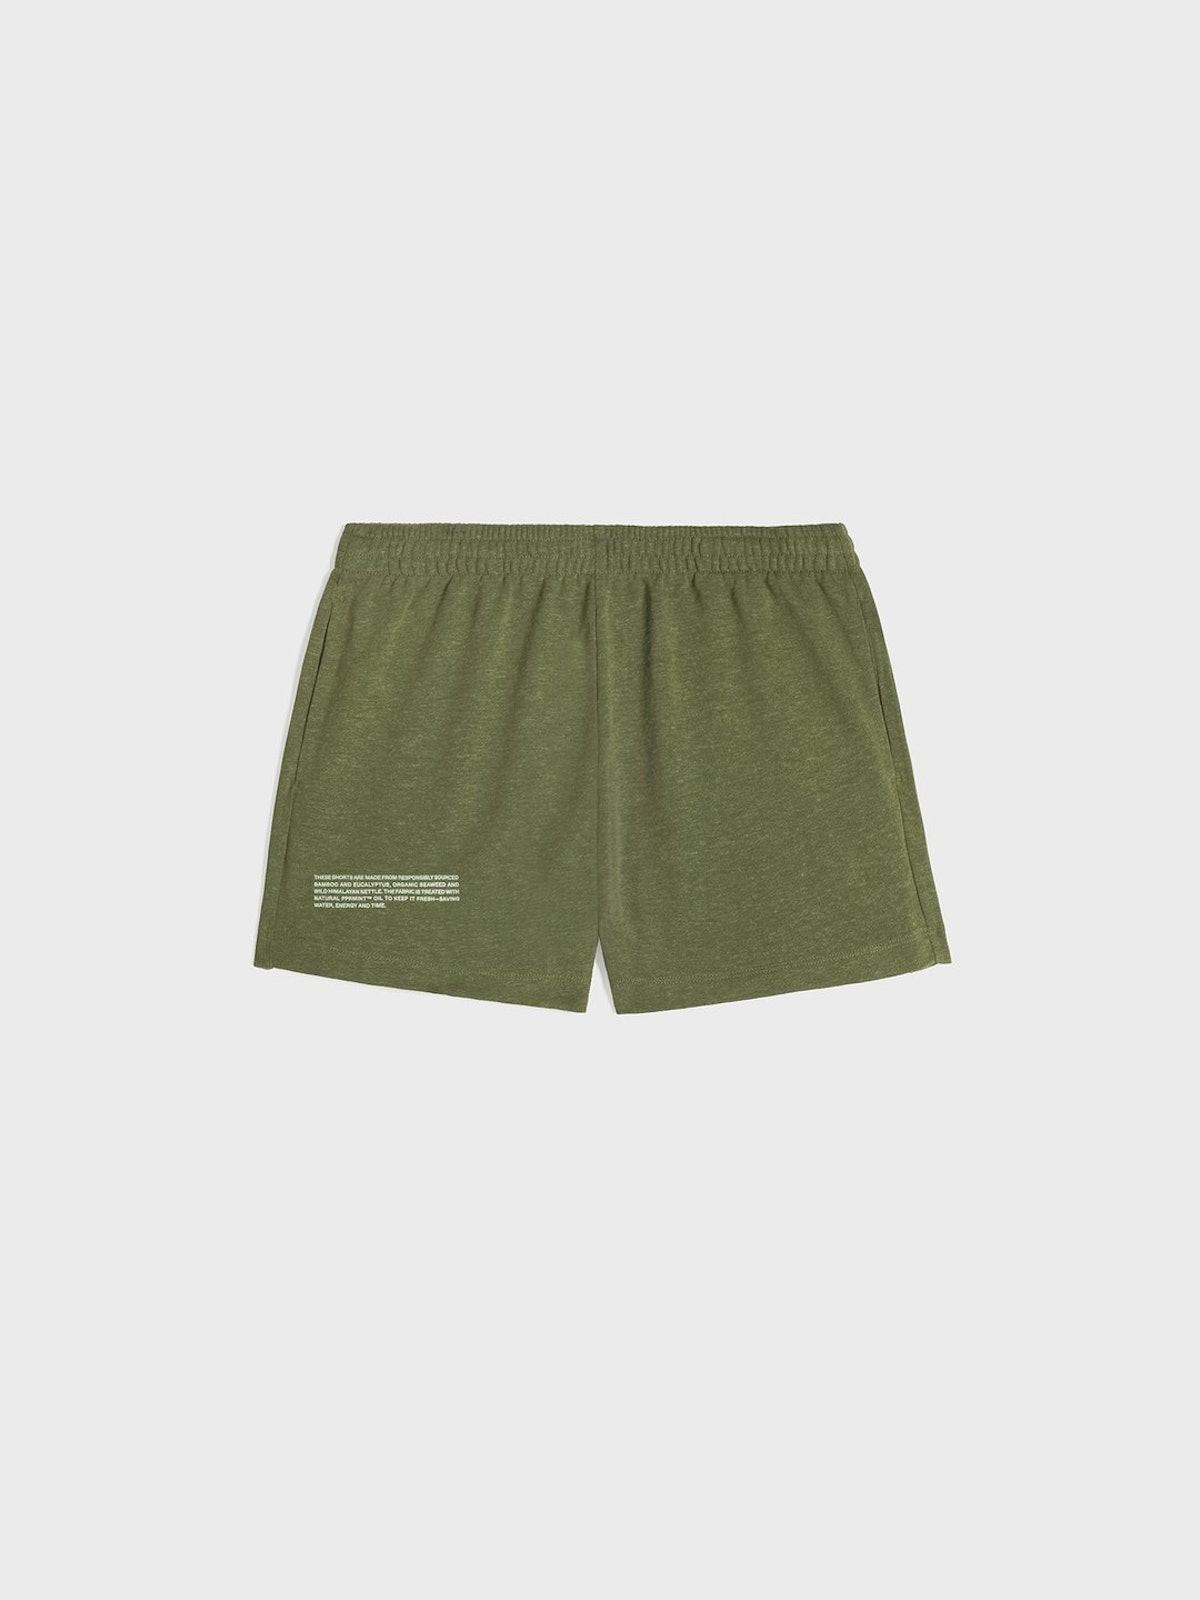 PLNTFIBER™ Shorts in Rosemary Green from PANGAIA.